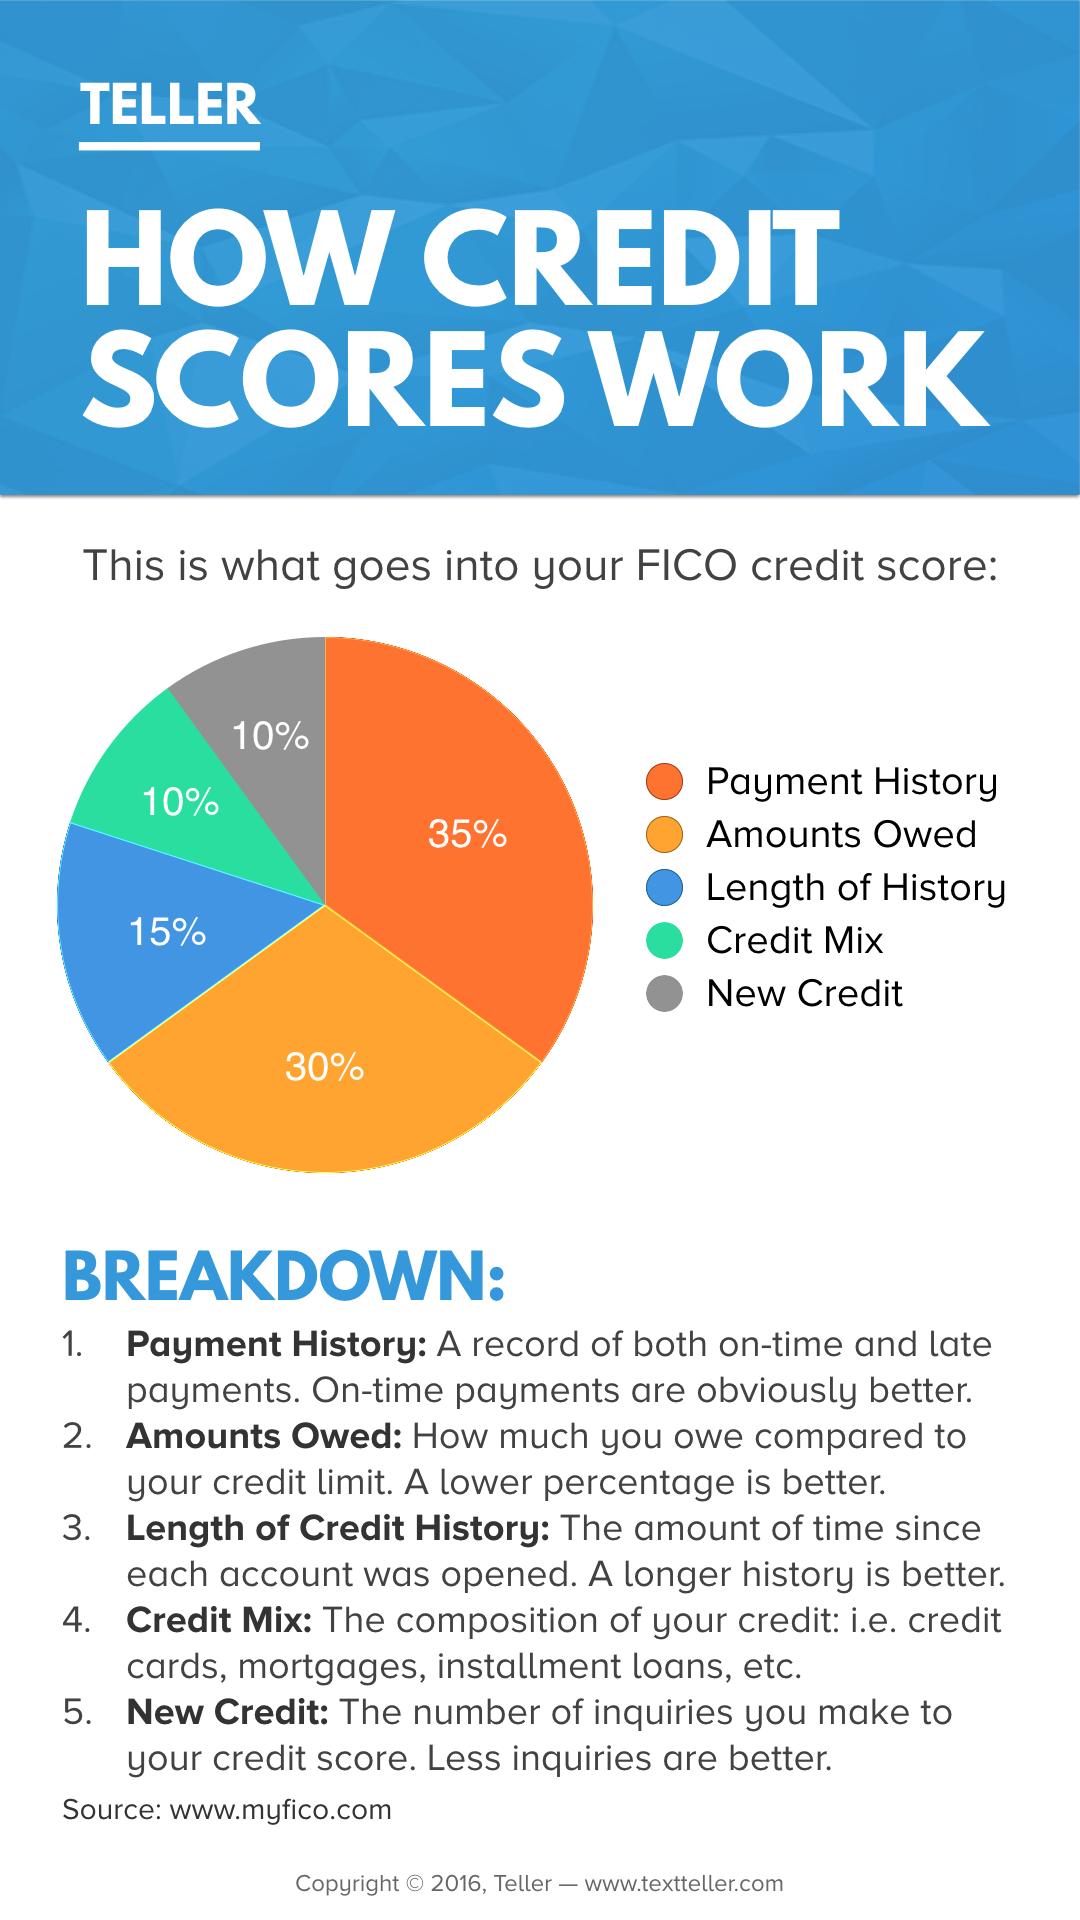 teller_credit_score_breakdown.png